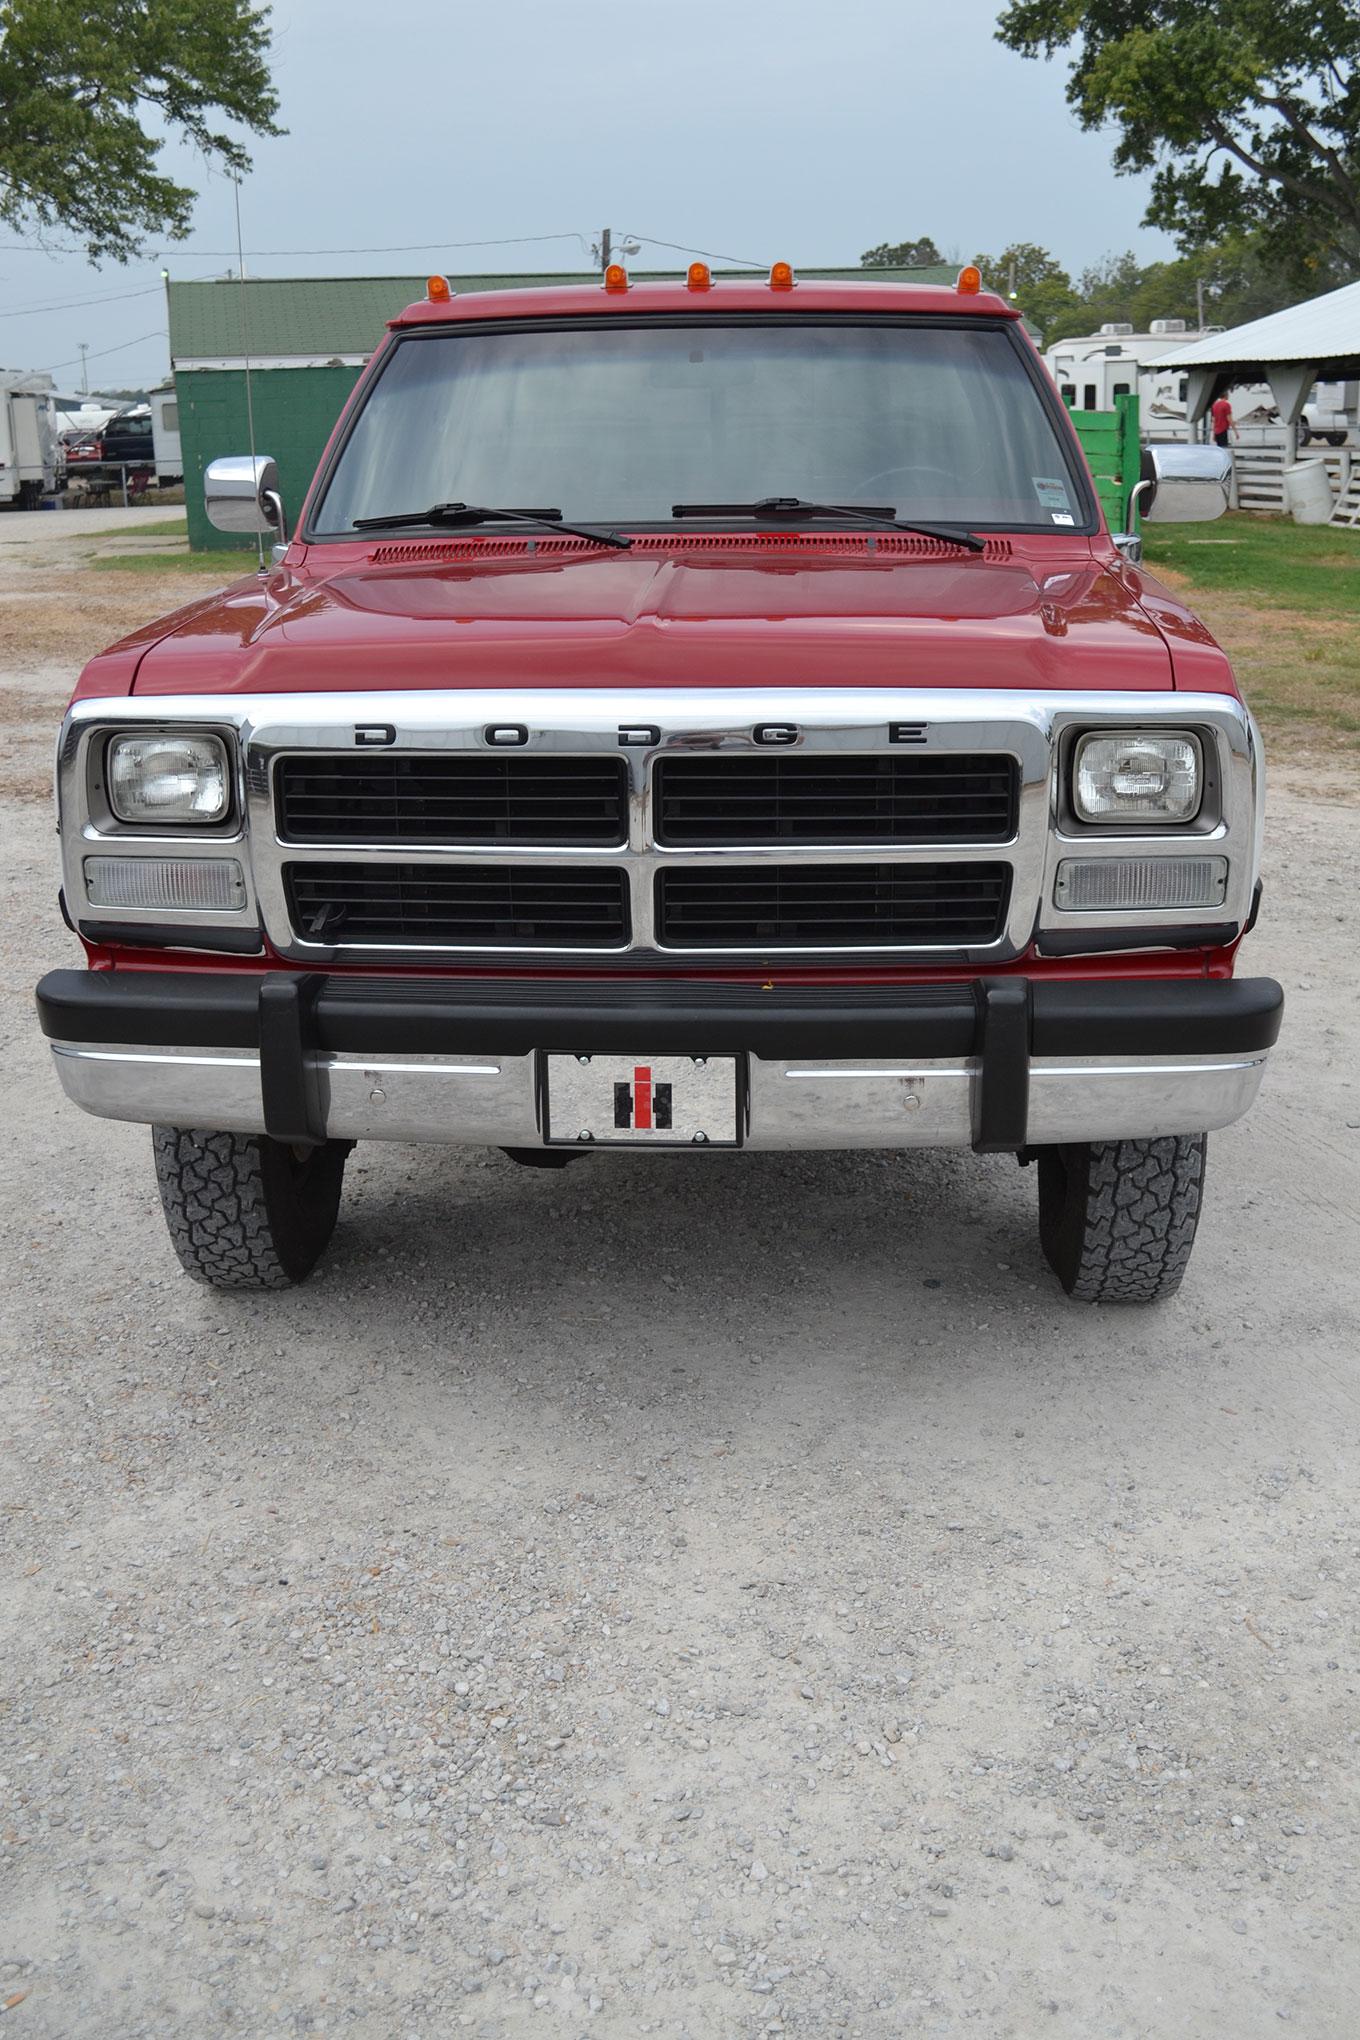 1993 Dodge Cummins 4x4 Sale : dodge, cummins, Dodge, That's, Clean